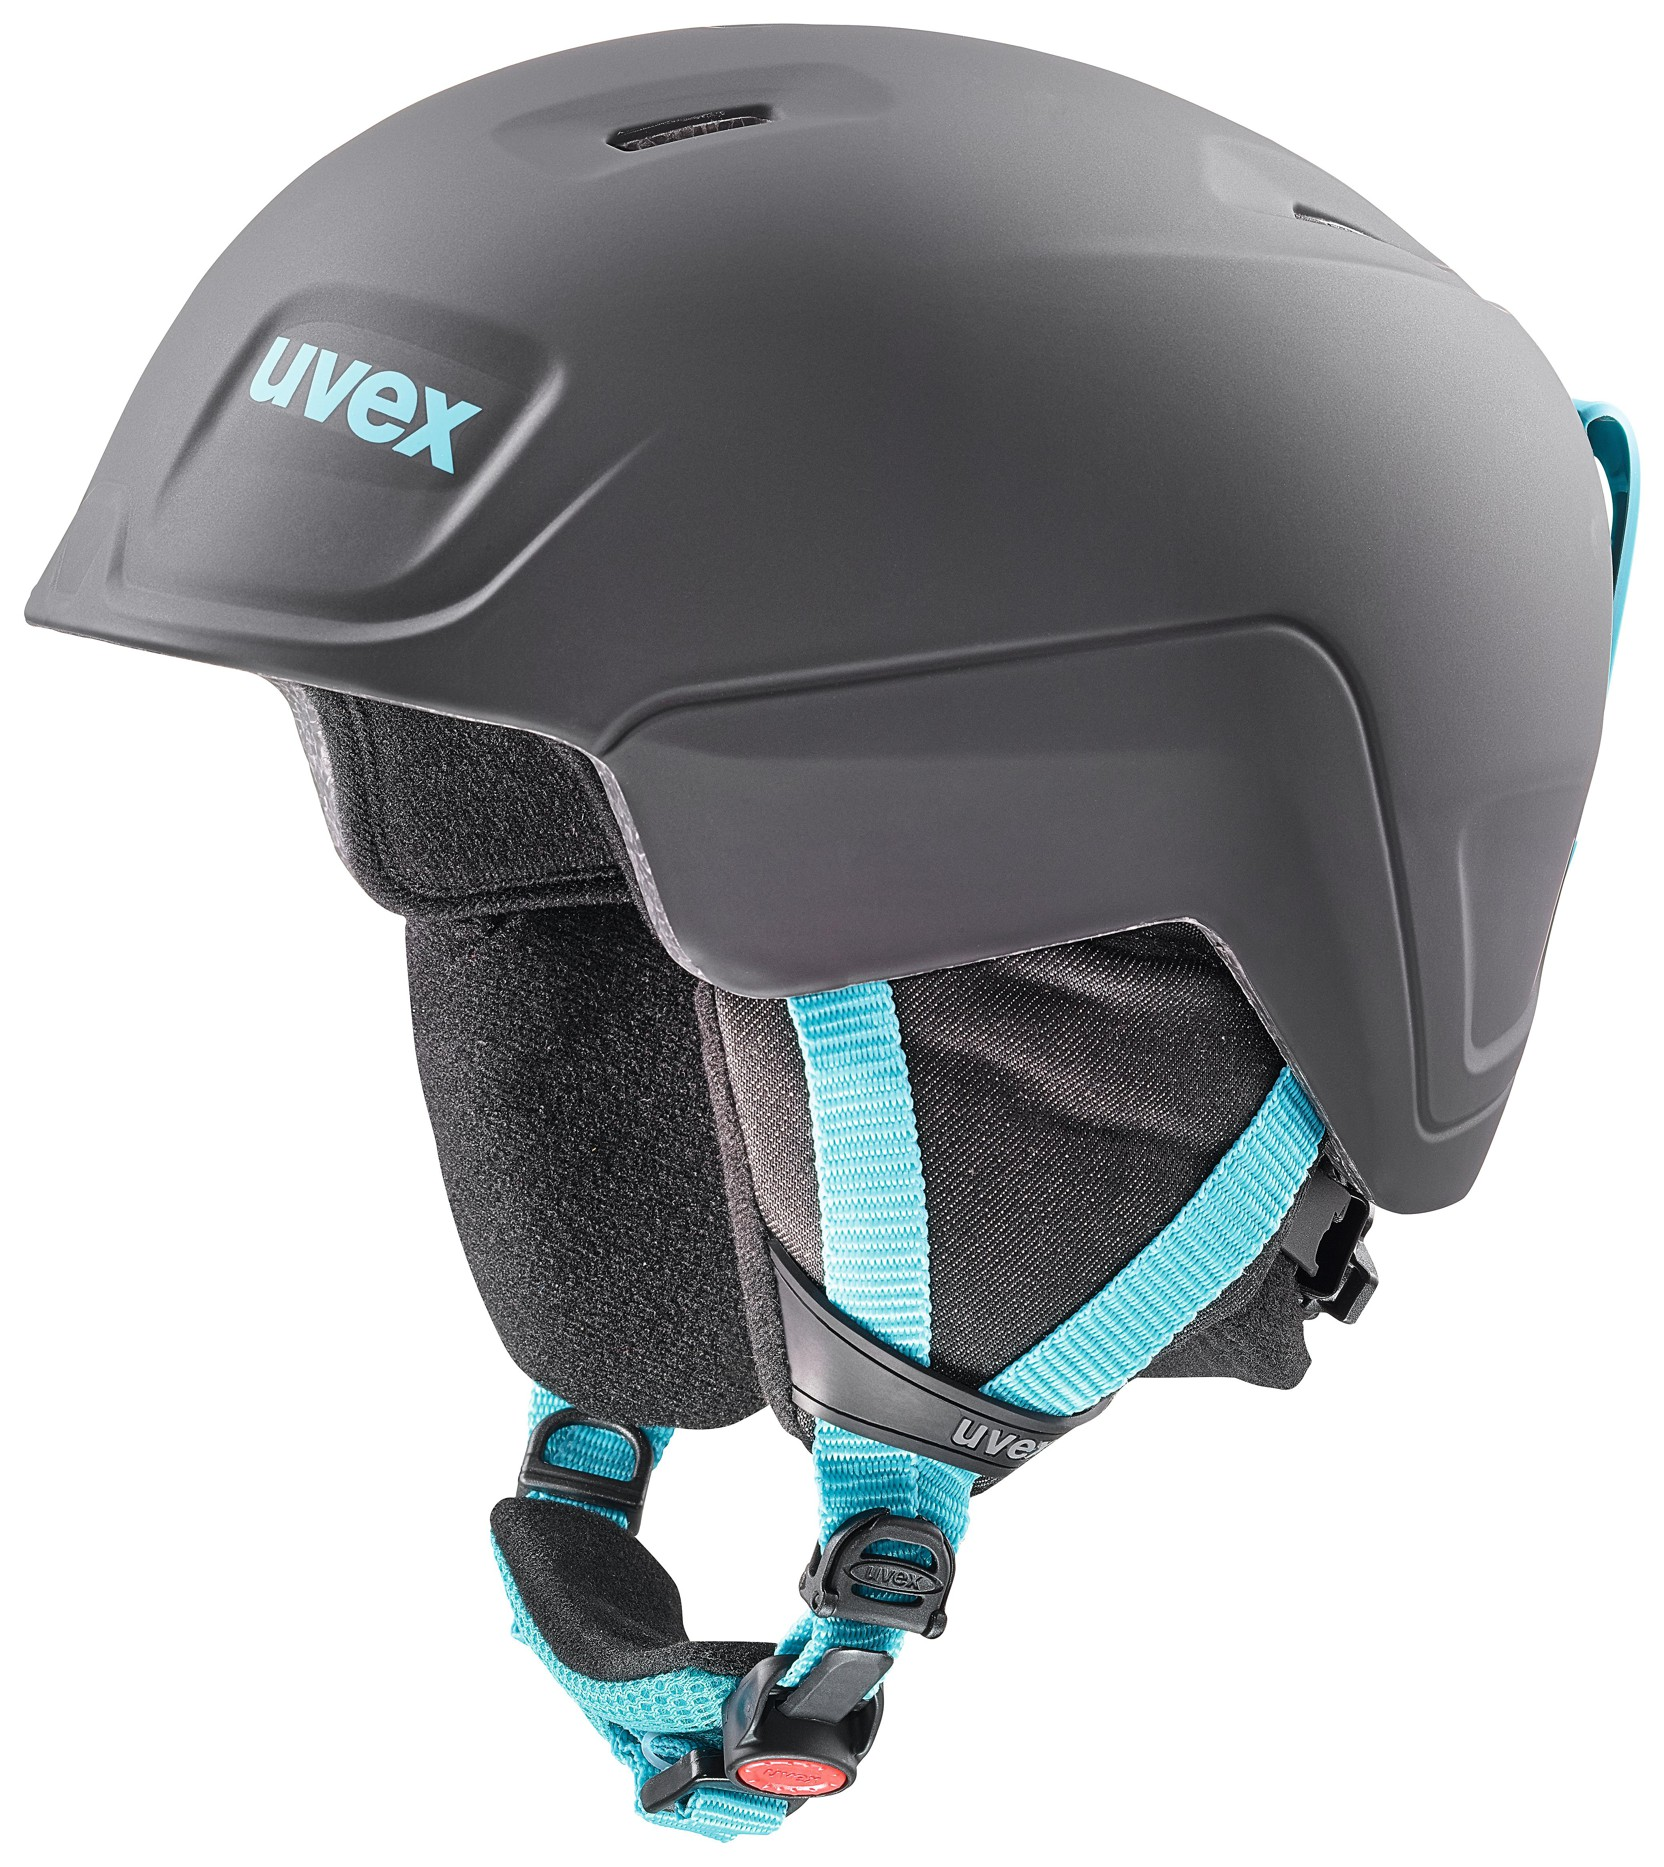 Uvex Шлем детский Uvex Manic Pro шлем для скейтборда pro tec classic matte brown retro